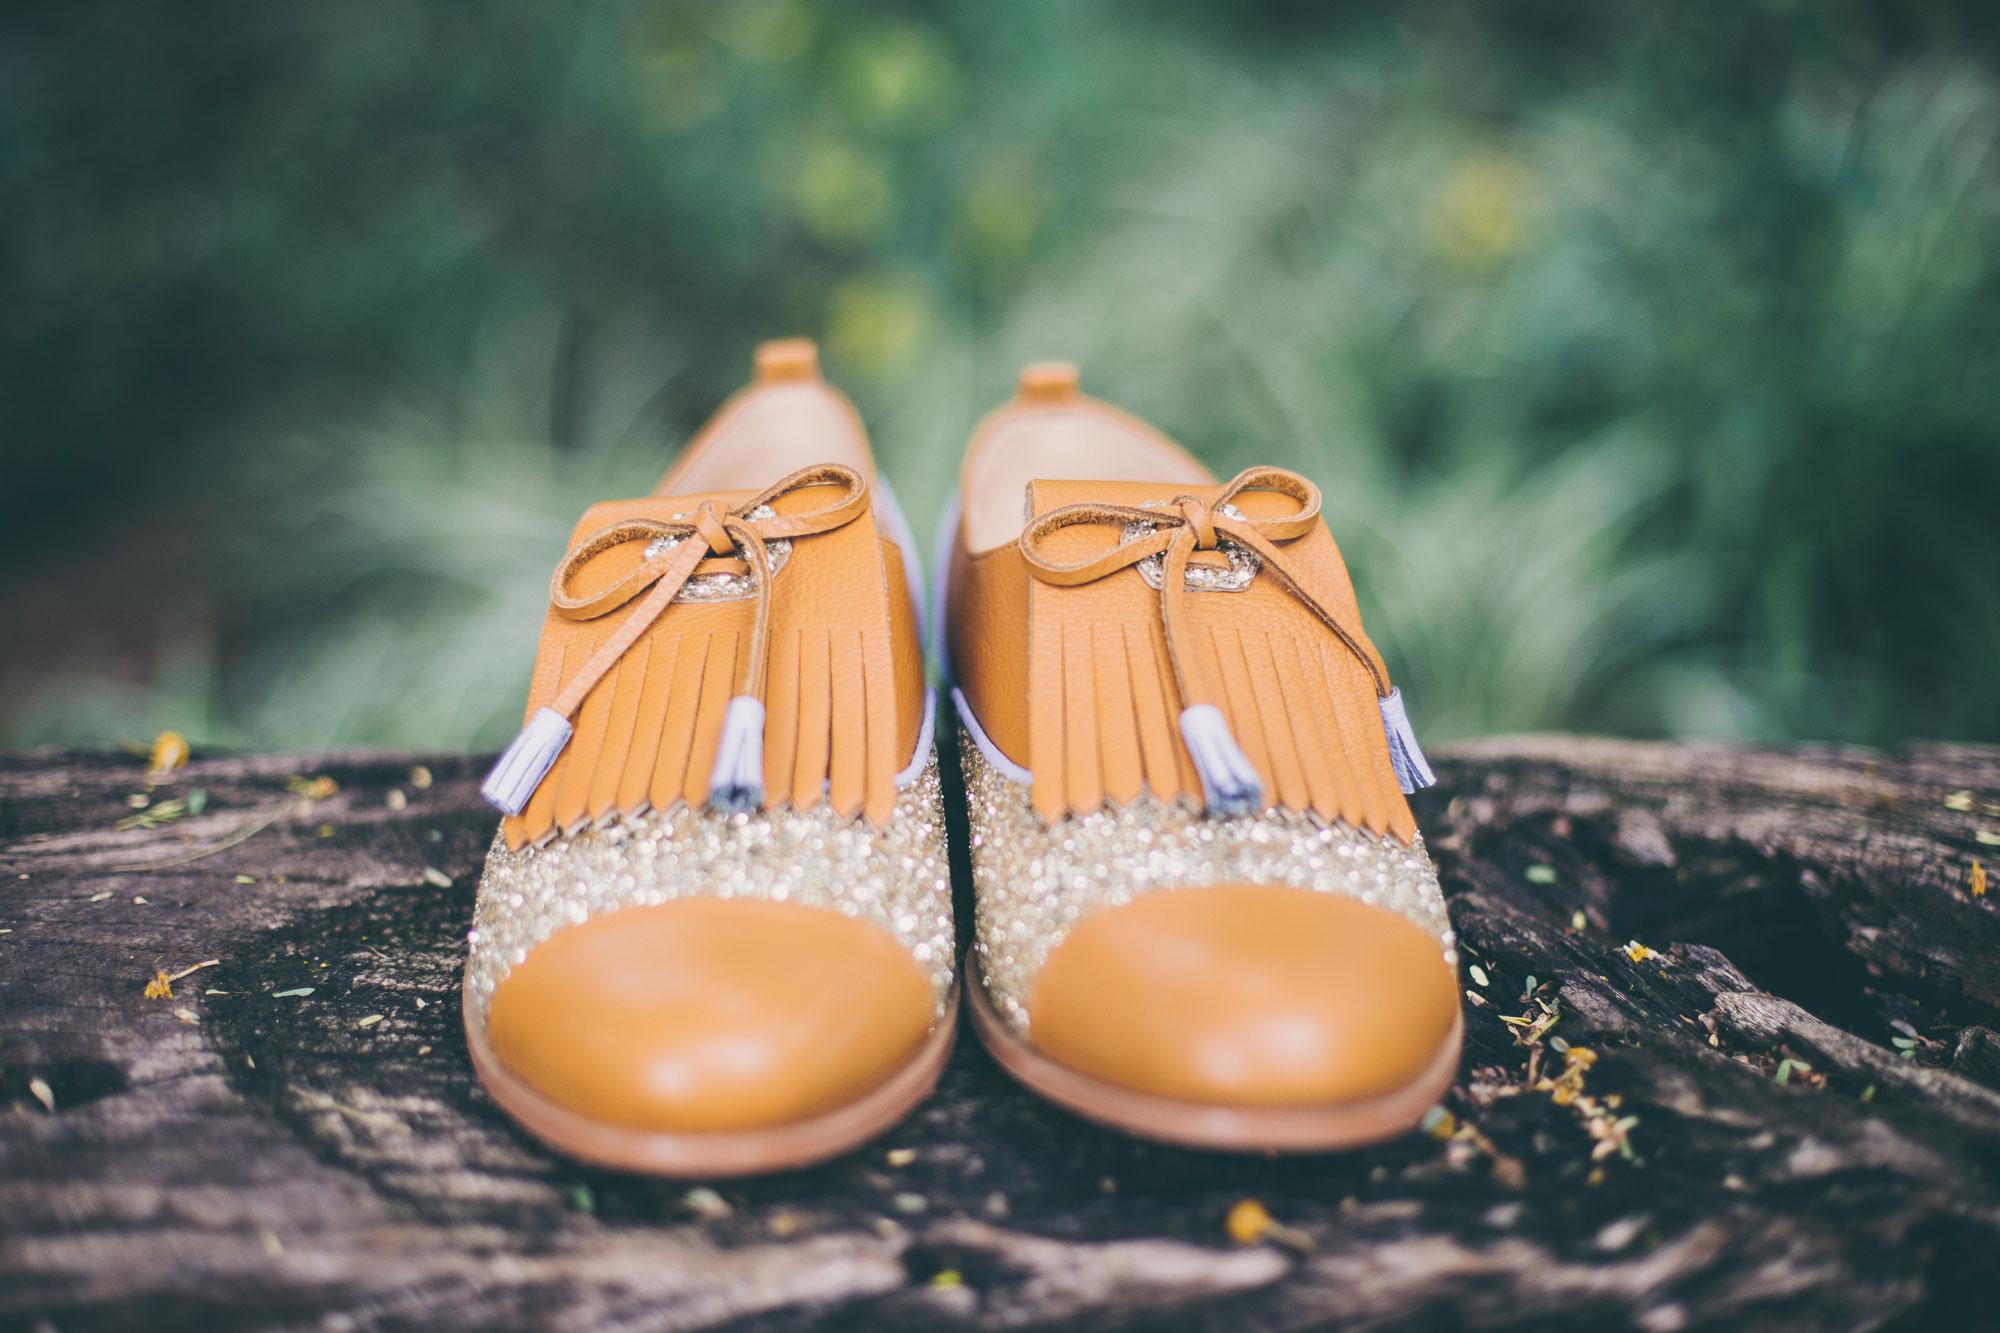 The Nutcracker_Wedding Photography_Maryke Albertyn 14